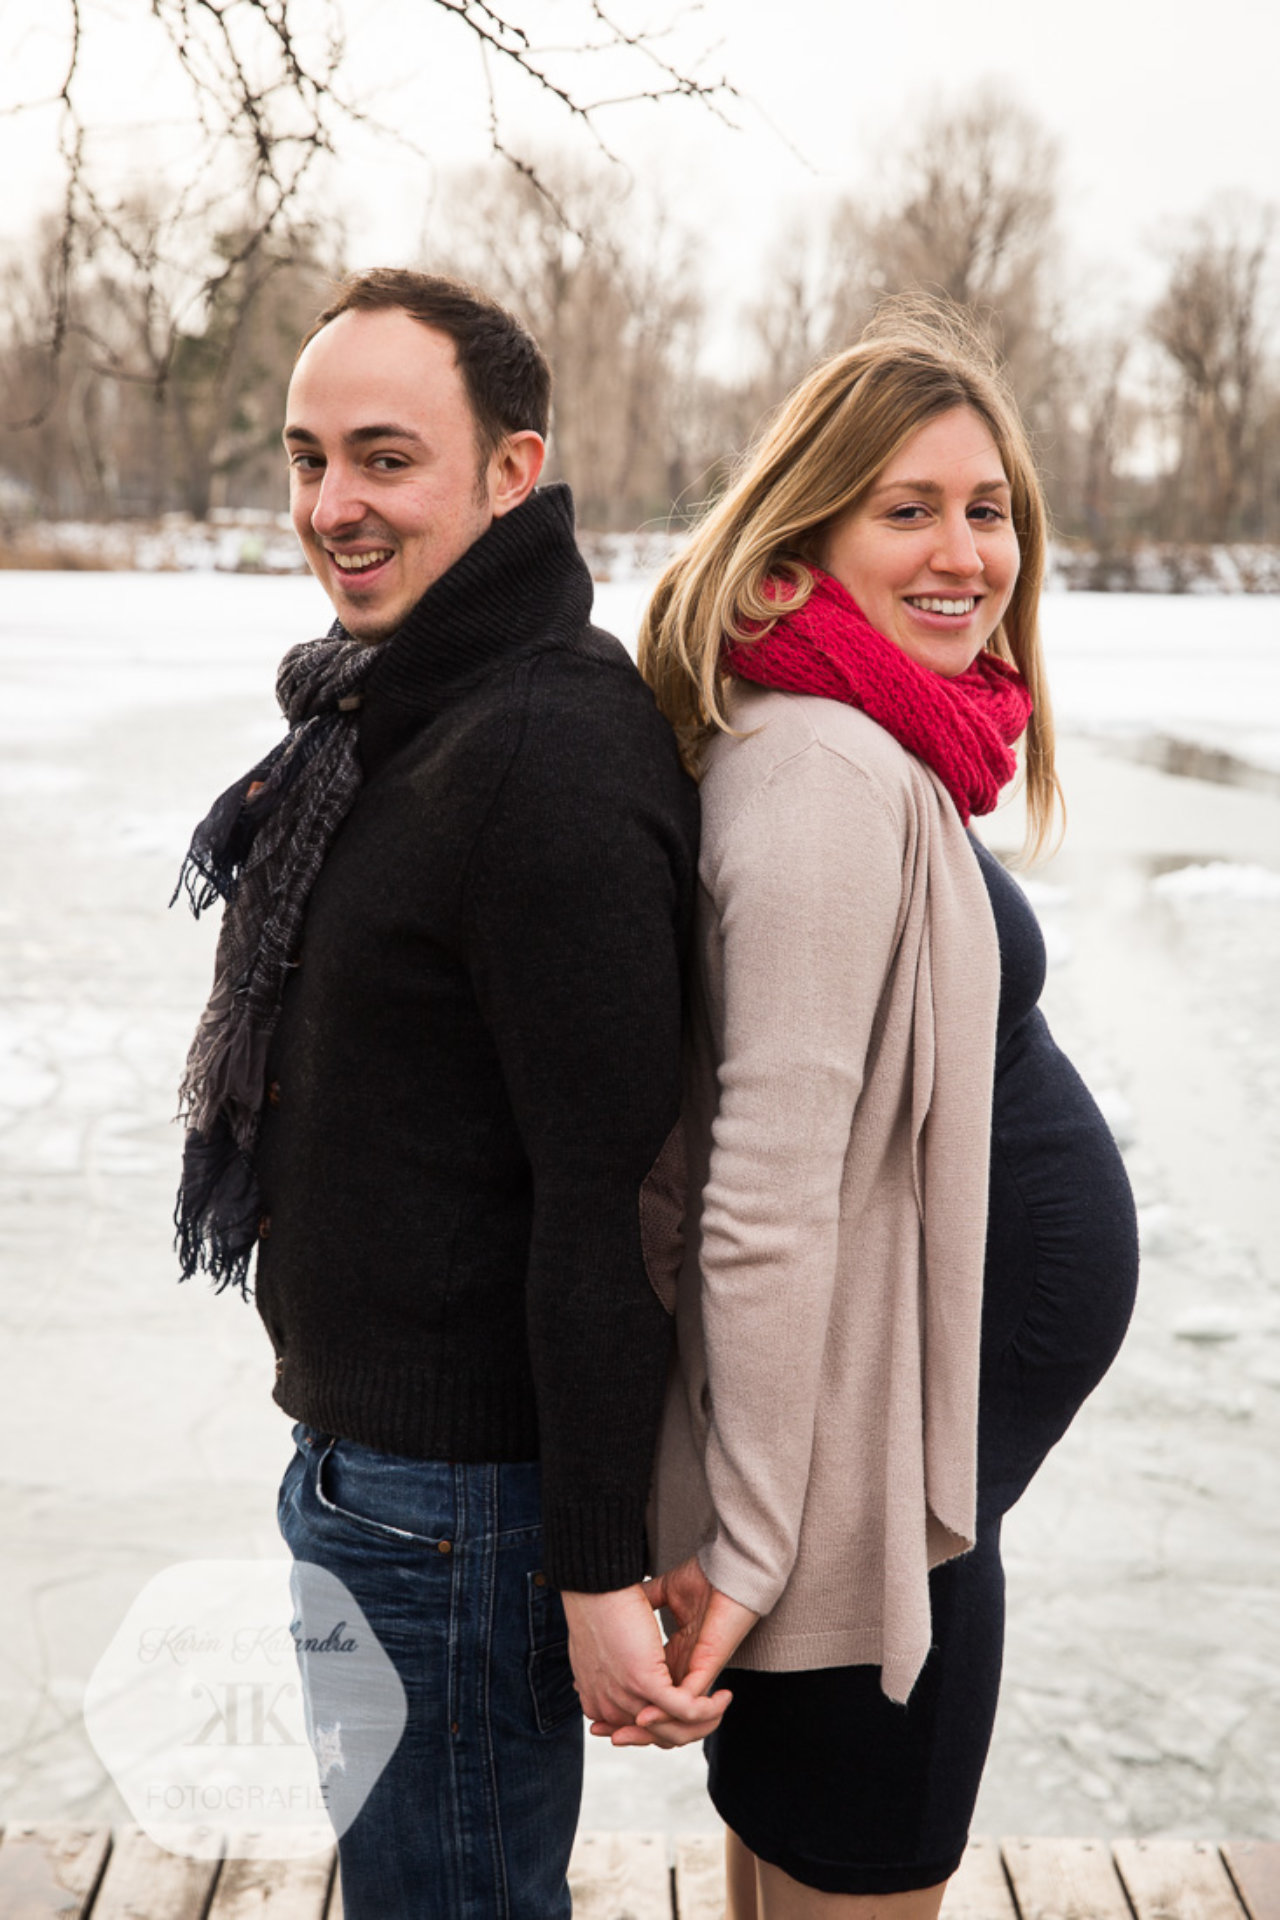 Schwangerschaftsfotografie #5